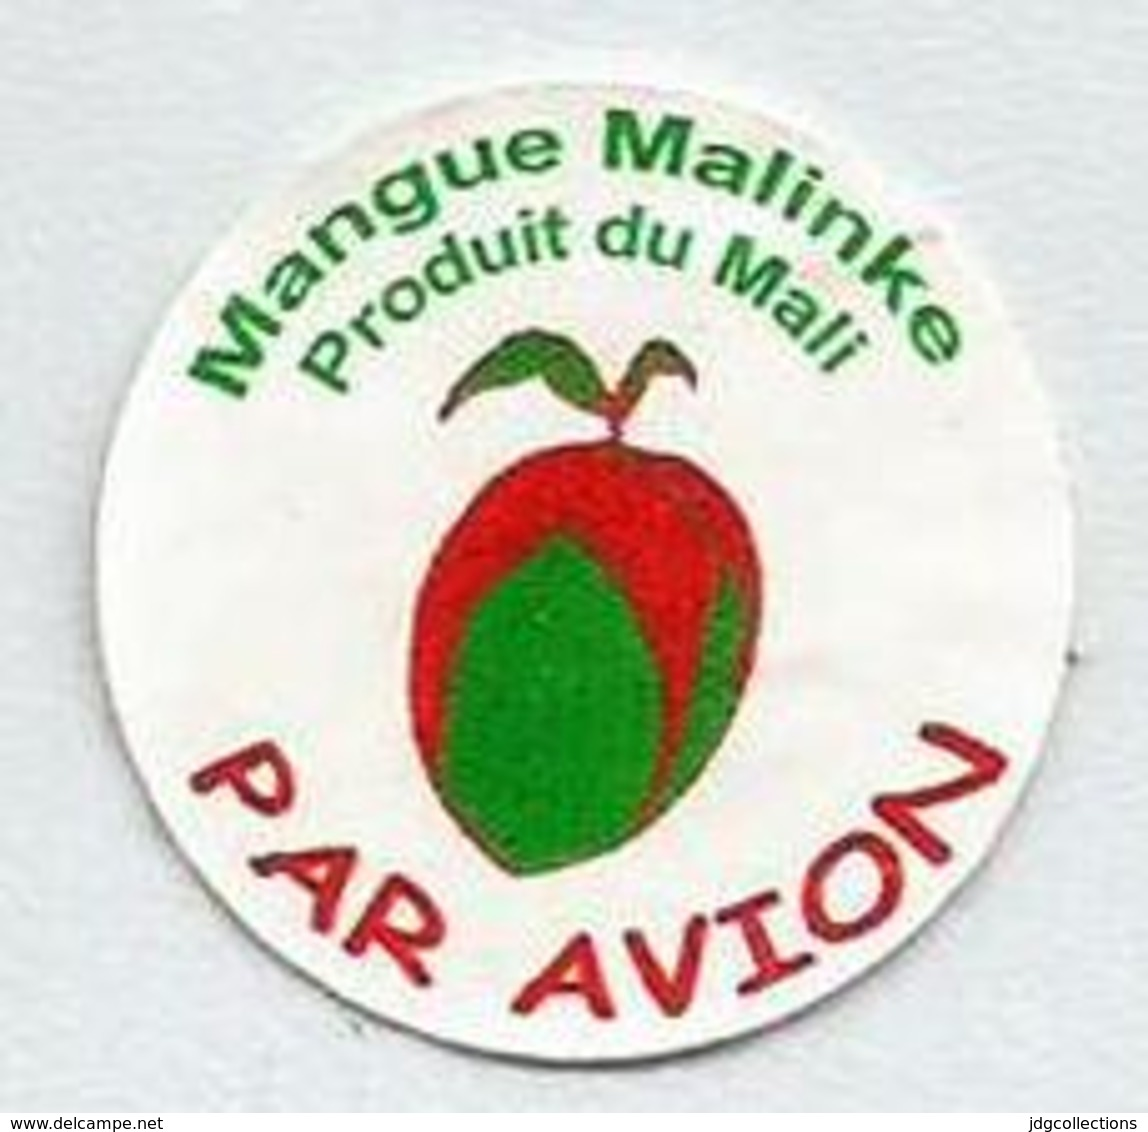 # MANGO MALINKE - MALI, Fruit Sticker Label Etiquette Etiqueta Adhesive Aufkleber Fruta Frucht By Air Par Avion - Fruits & Vegetables